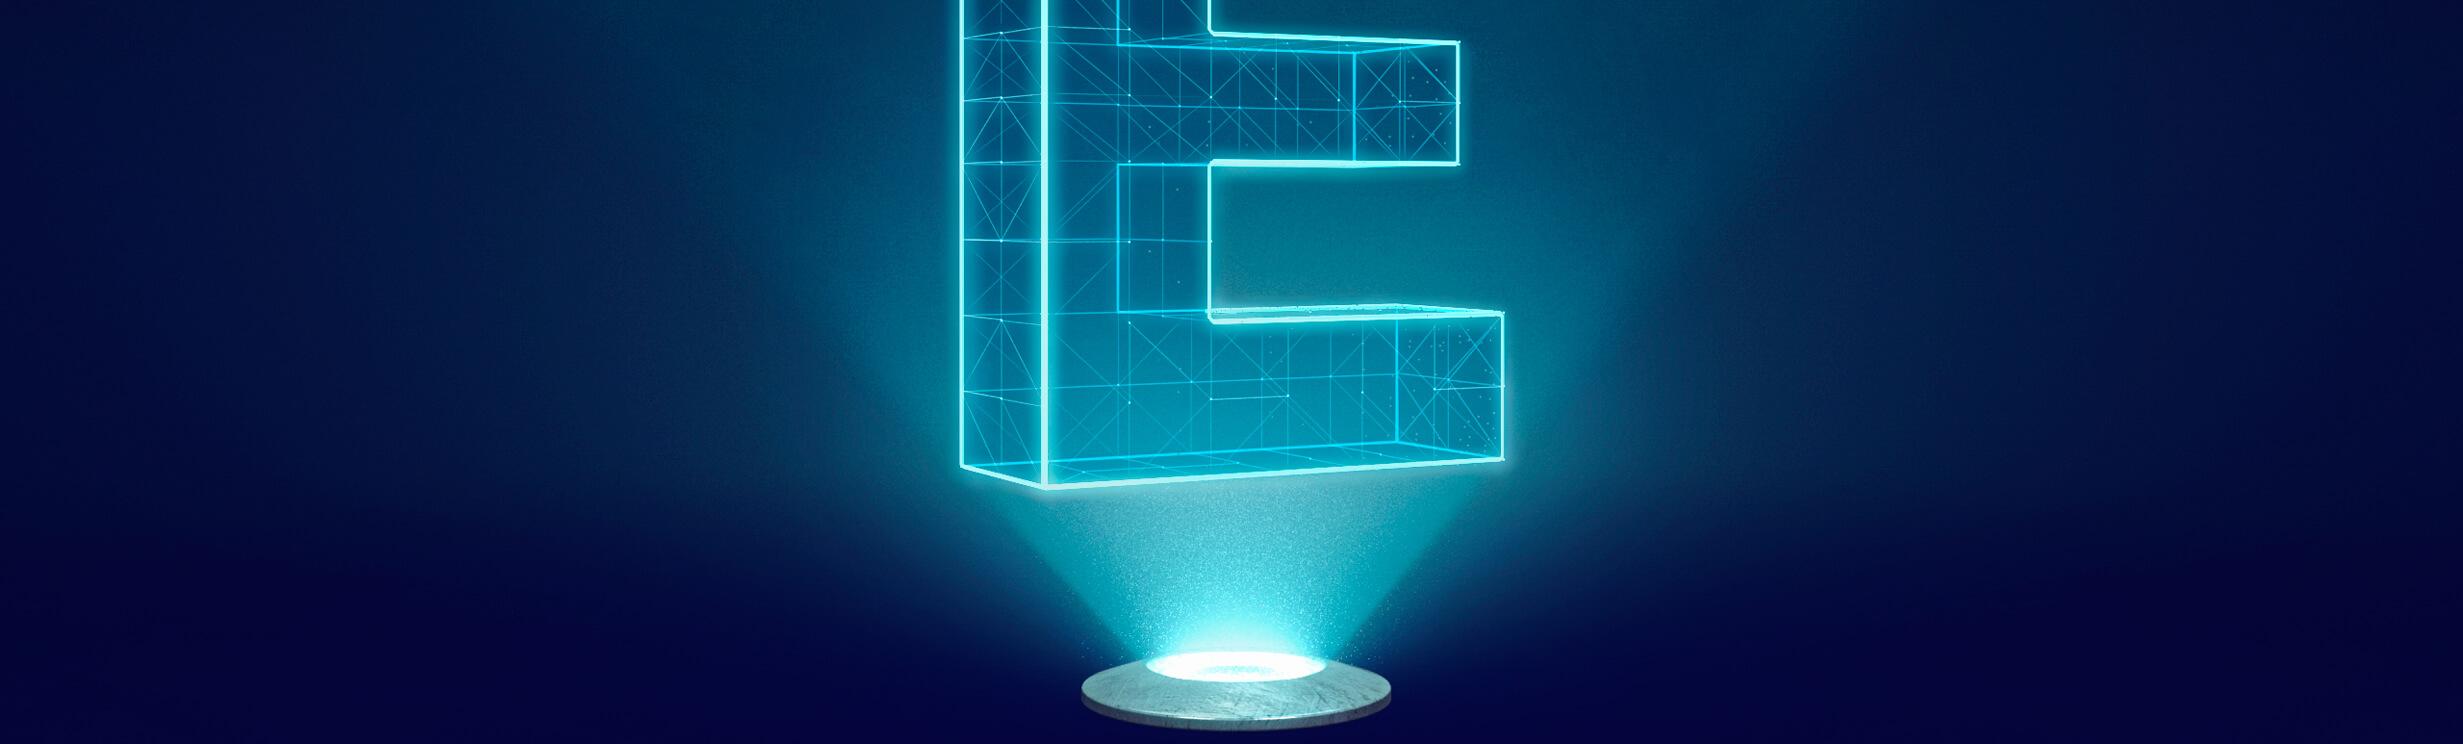 Buchstabe E symbolhaft umgesetzt